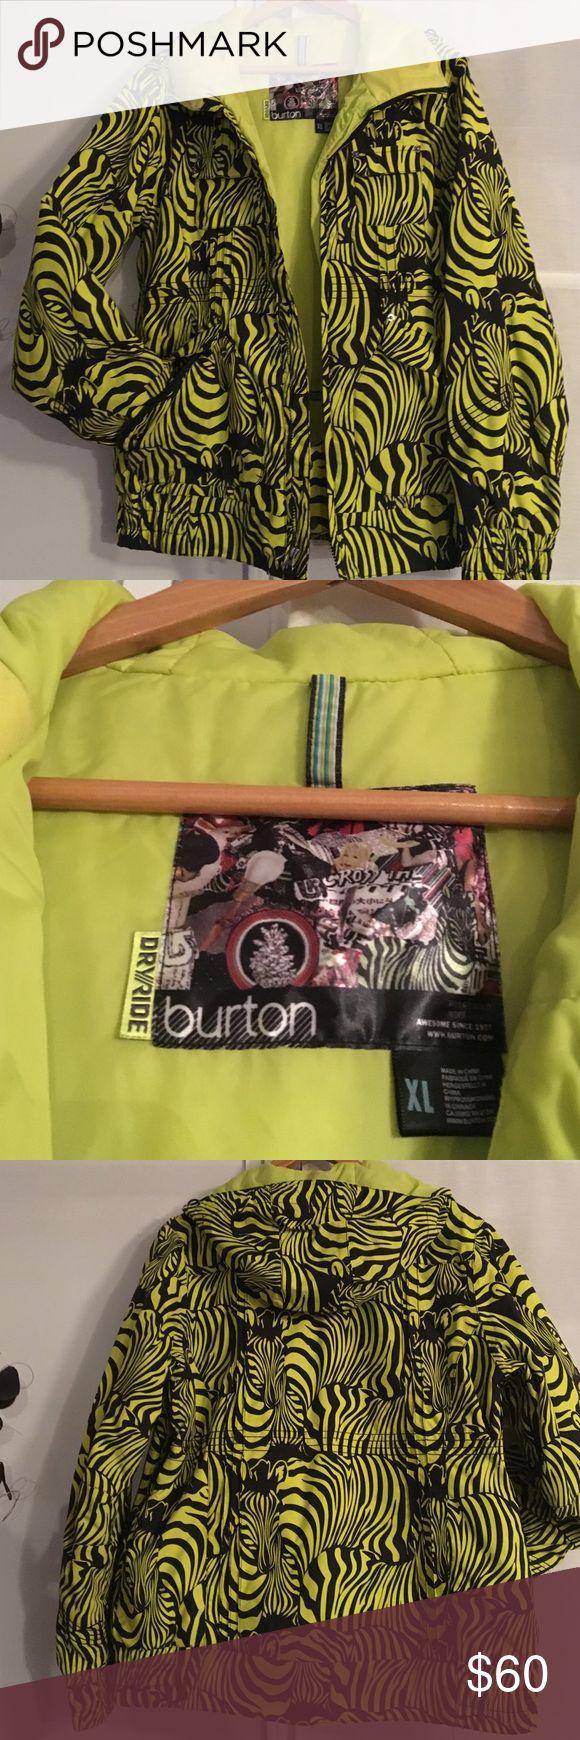 Burton Boarding Jacket Like new Burton boarding/ski jacket.. zebra print, pockets galore! My daughter moved south😁 Worn very little❤️ Burton Jackets & Coats